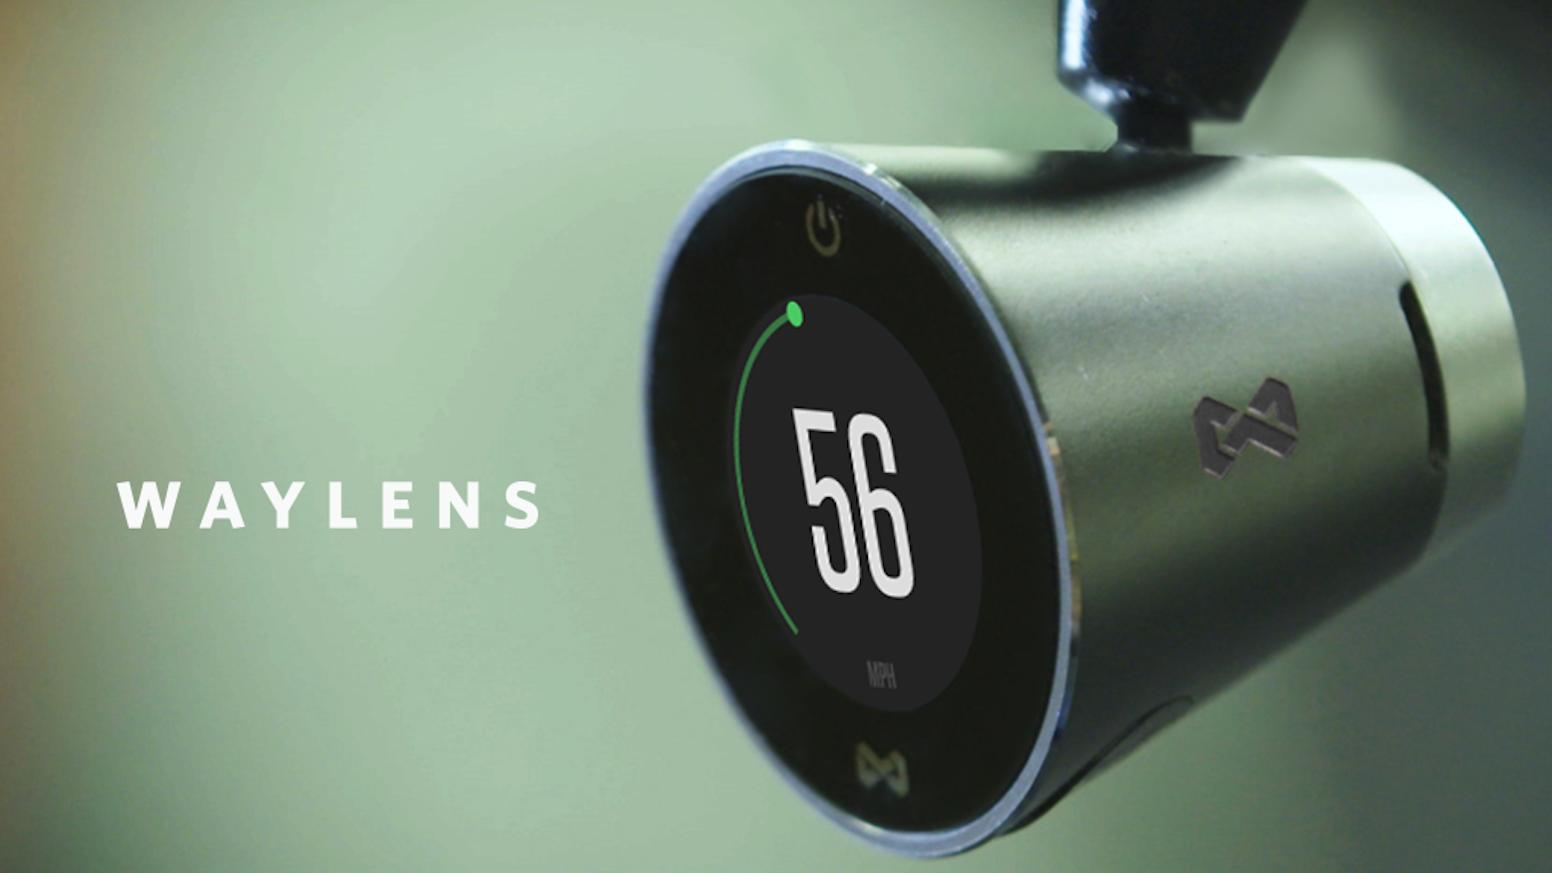 Waylens - A Data Driven Automotive Camera System by Waylens